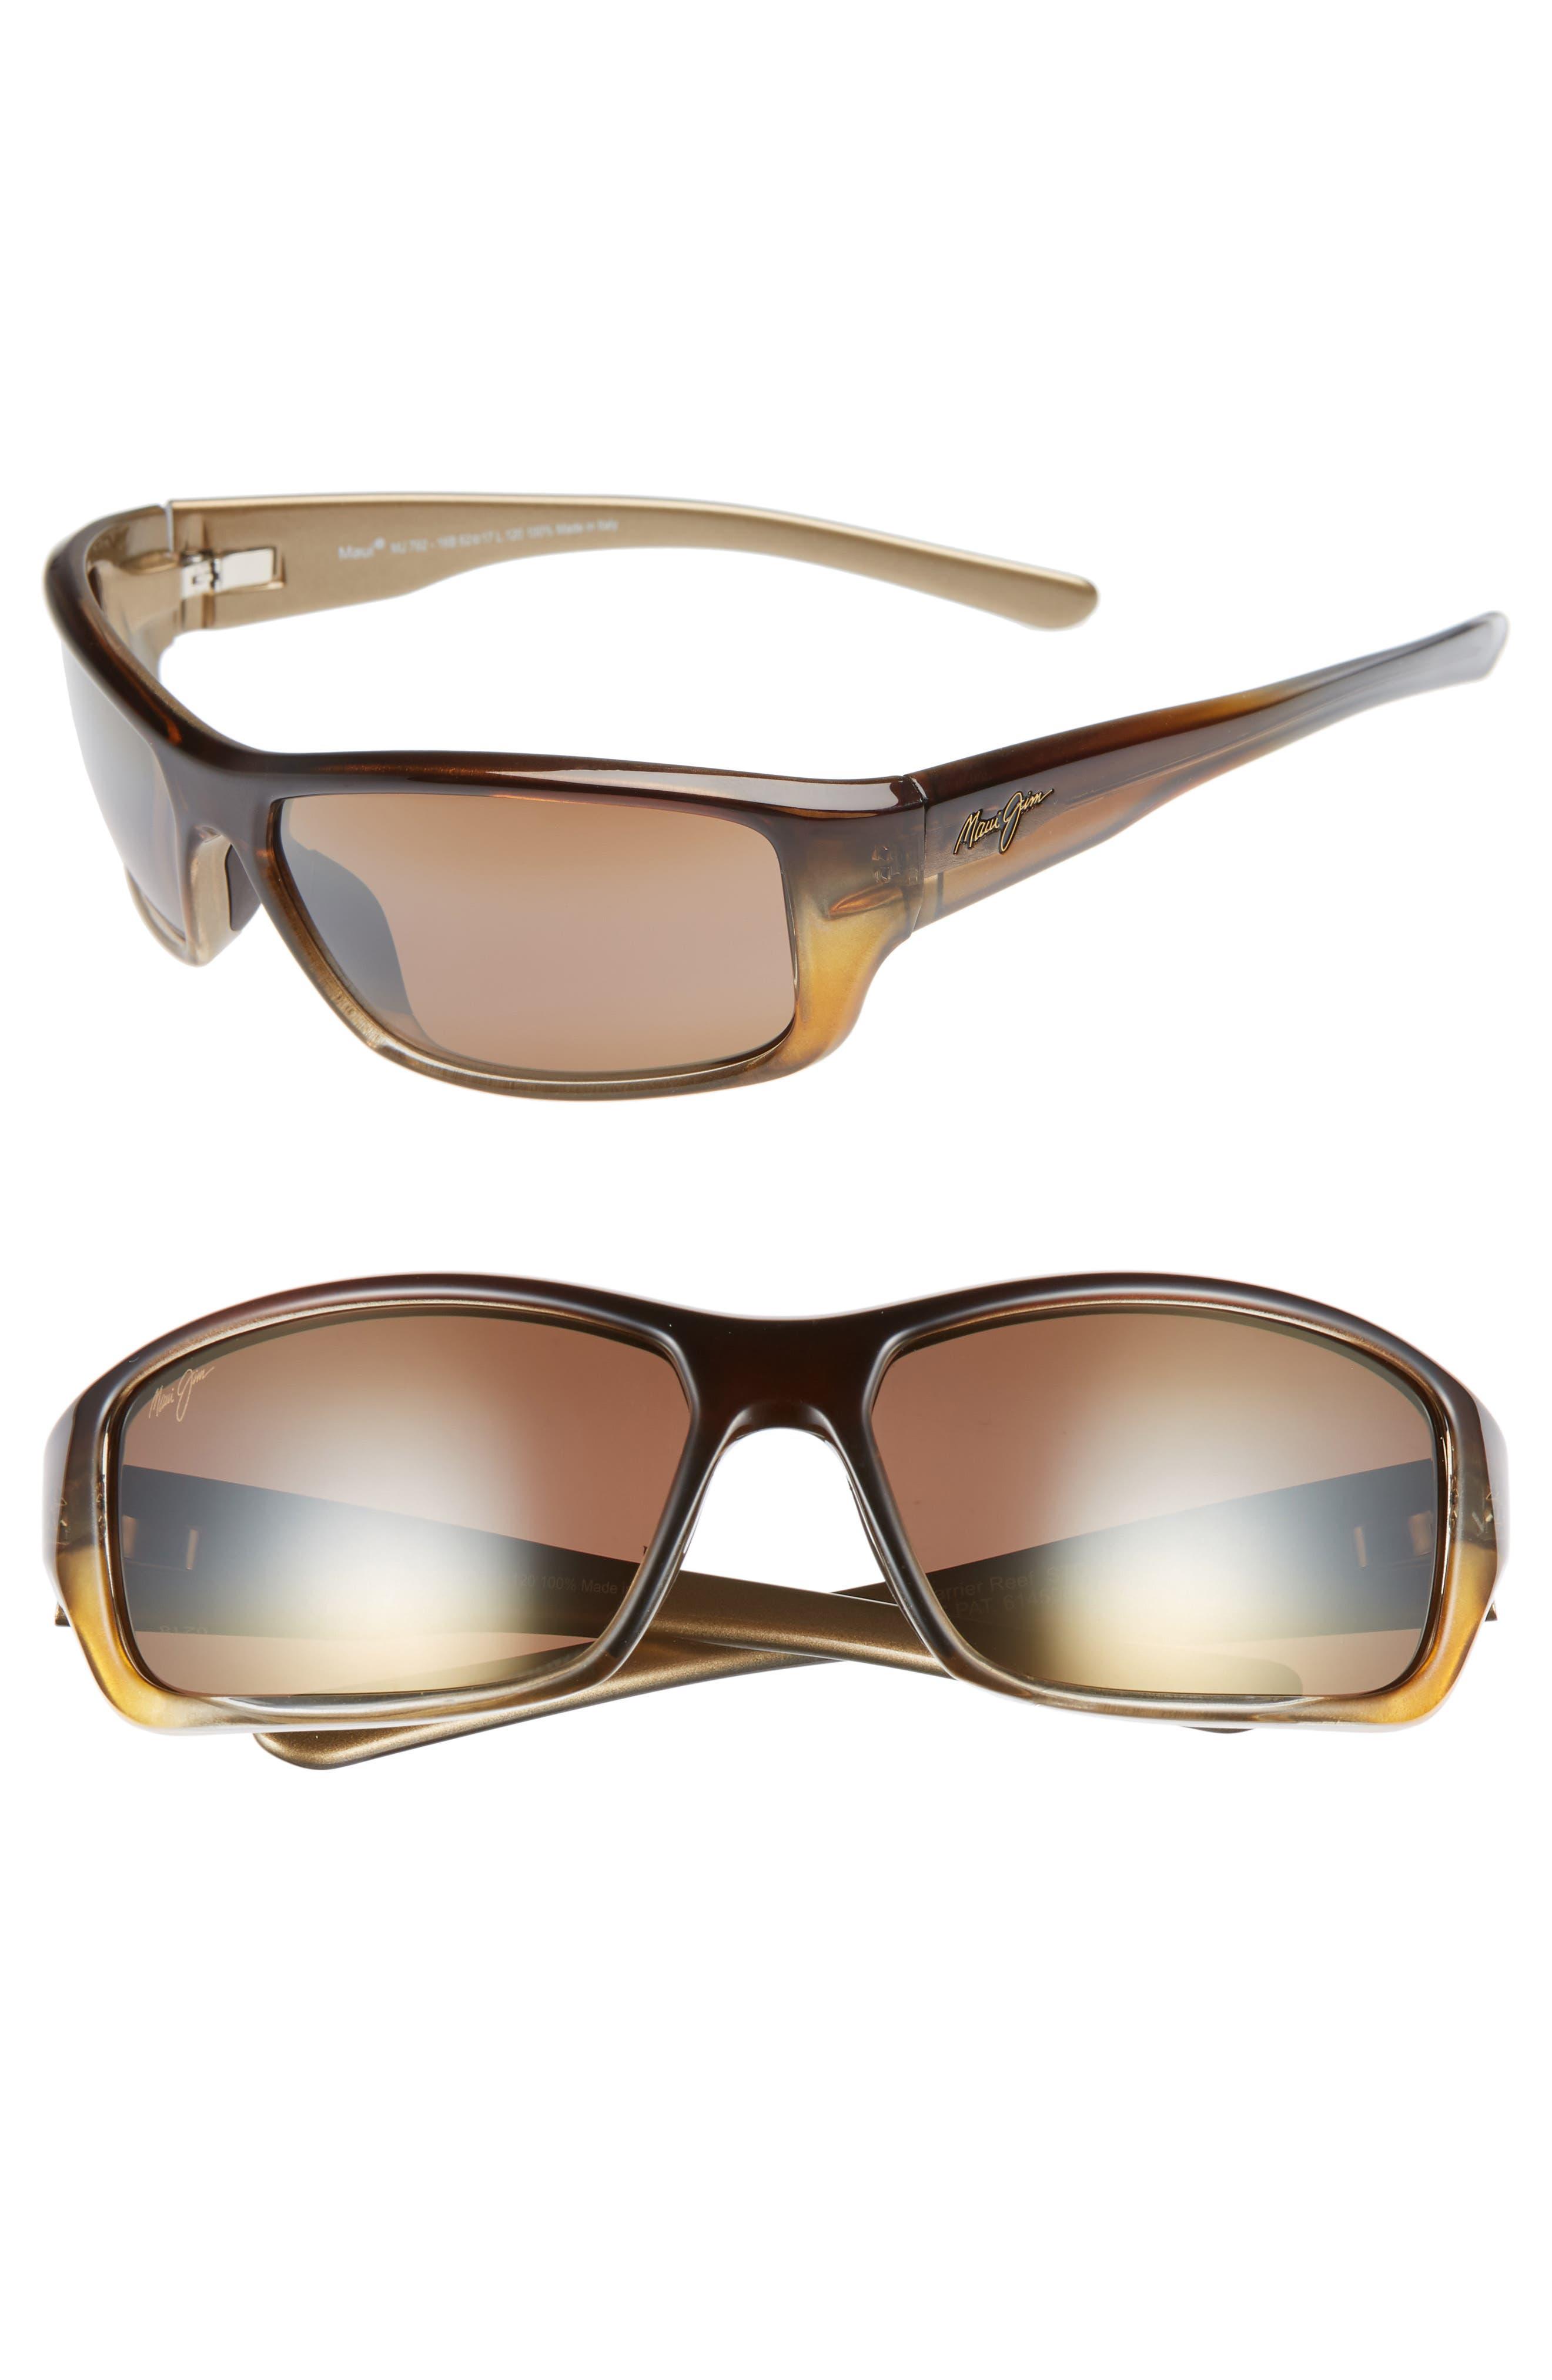 Maui Jim Barrier Reef 62Mm Polarizedplus2 Sunglasses - Brown Gold/ Bronze